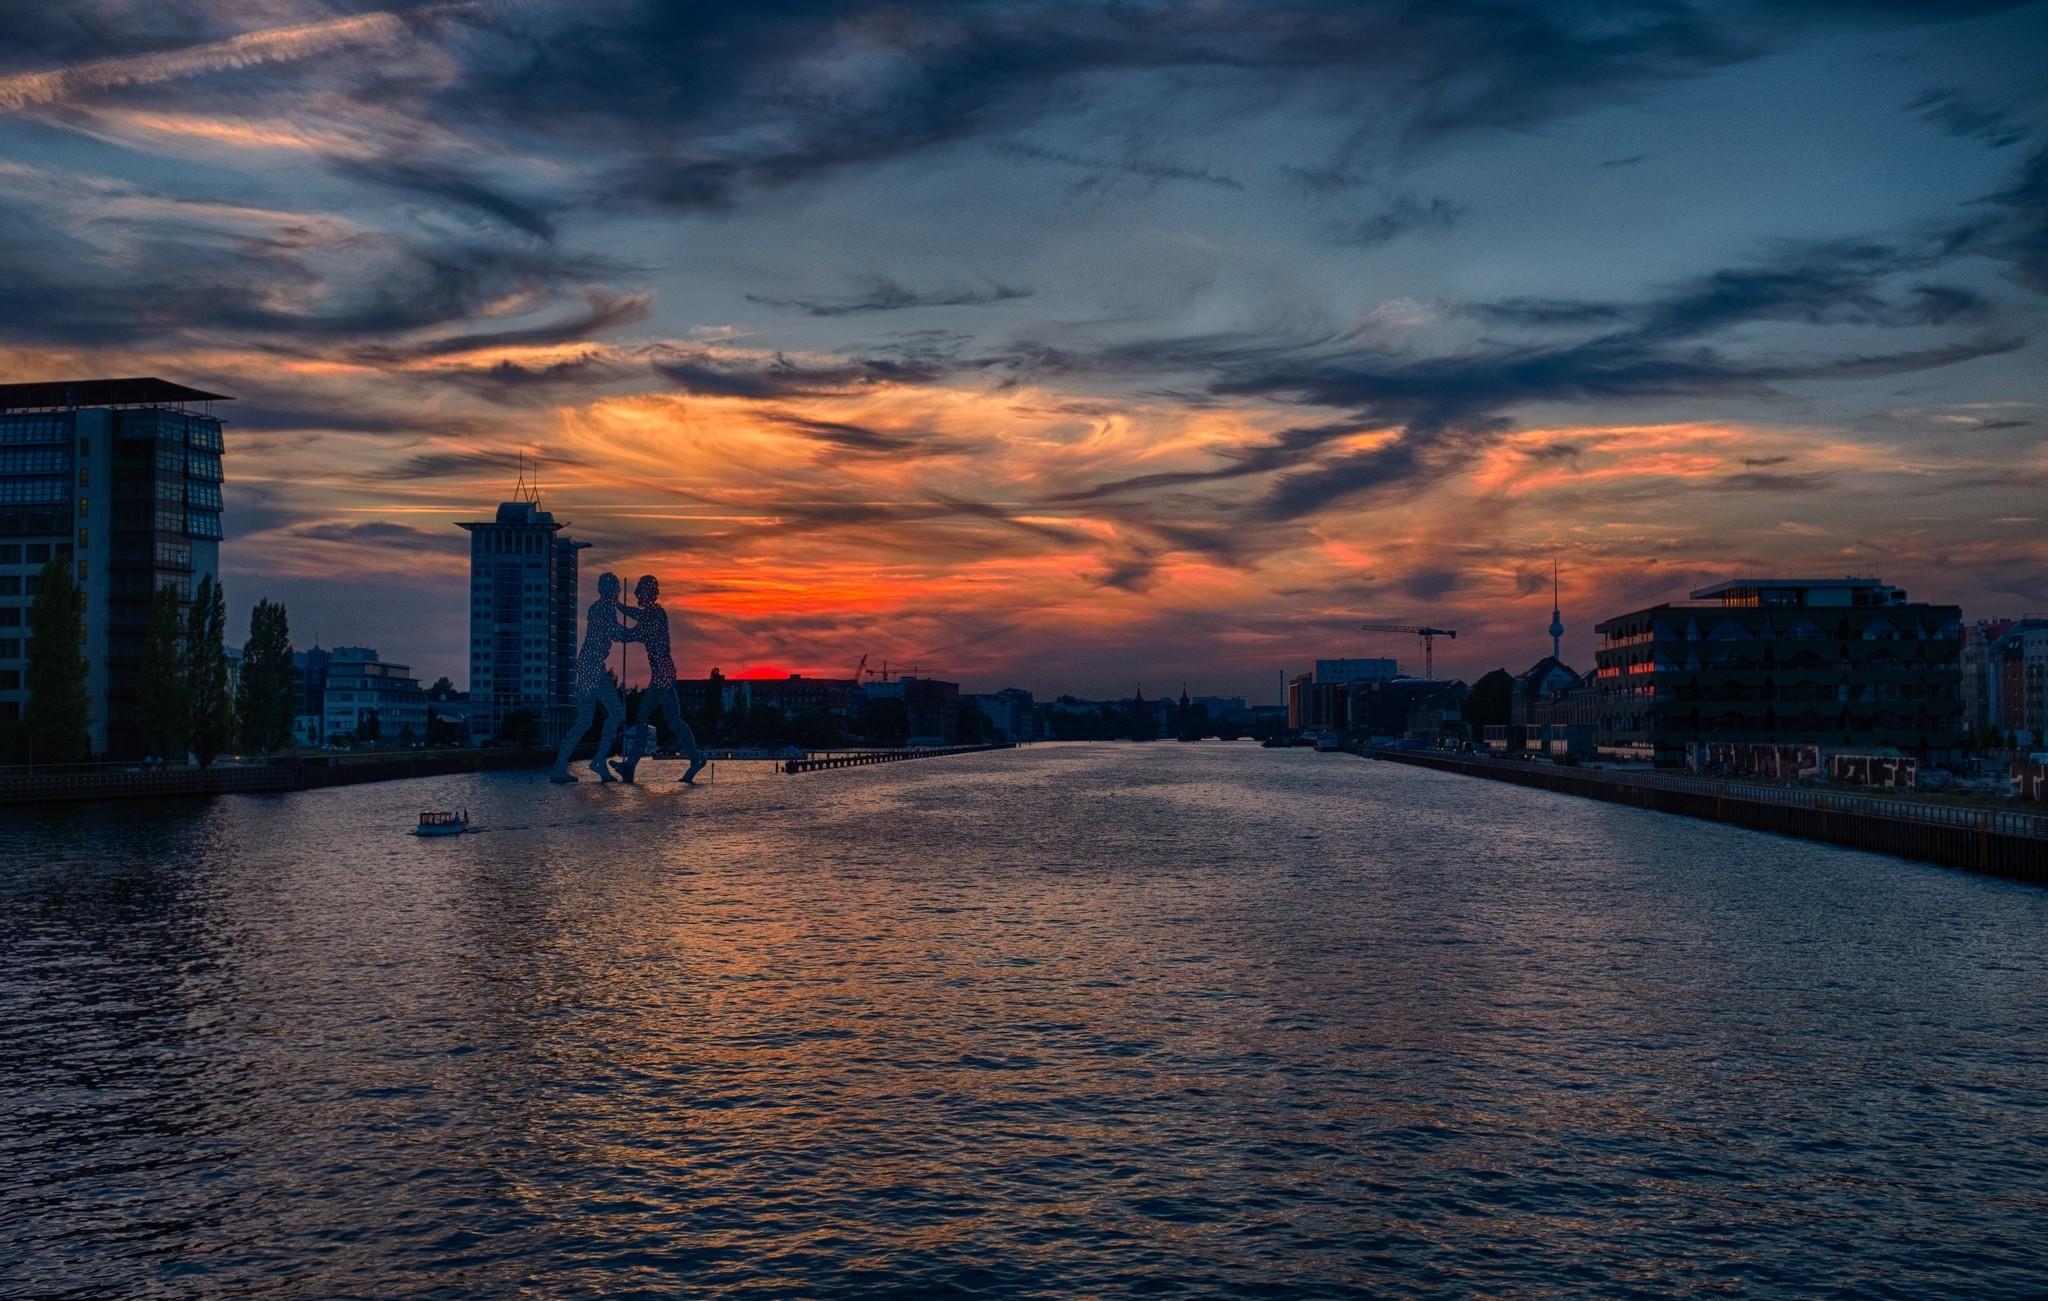 Berlin Elsenbrücke, Fuji X100T